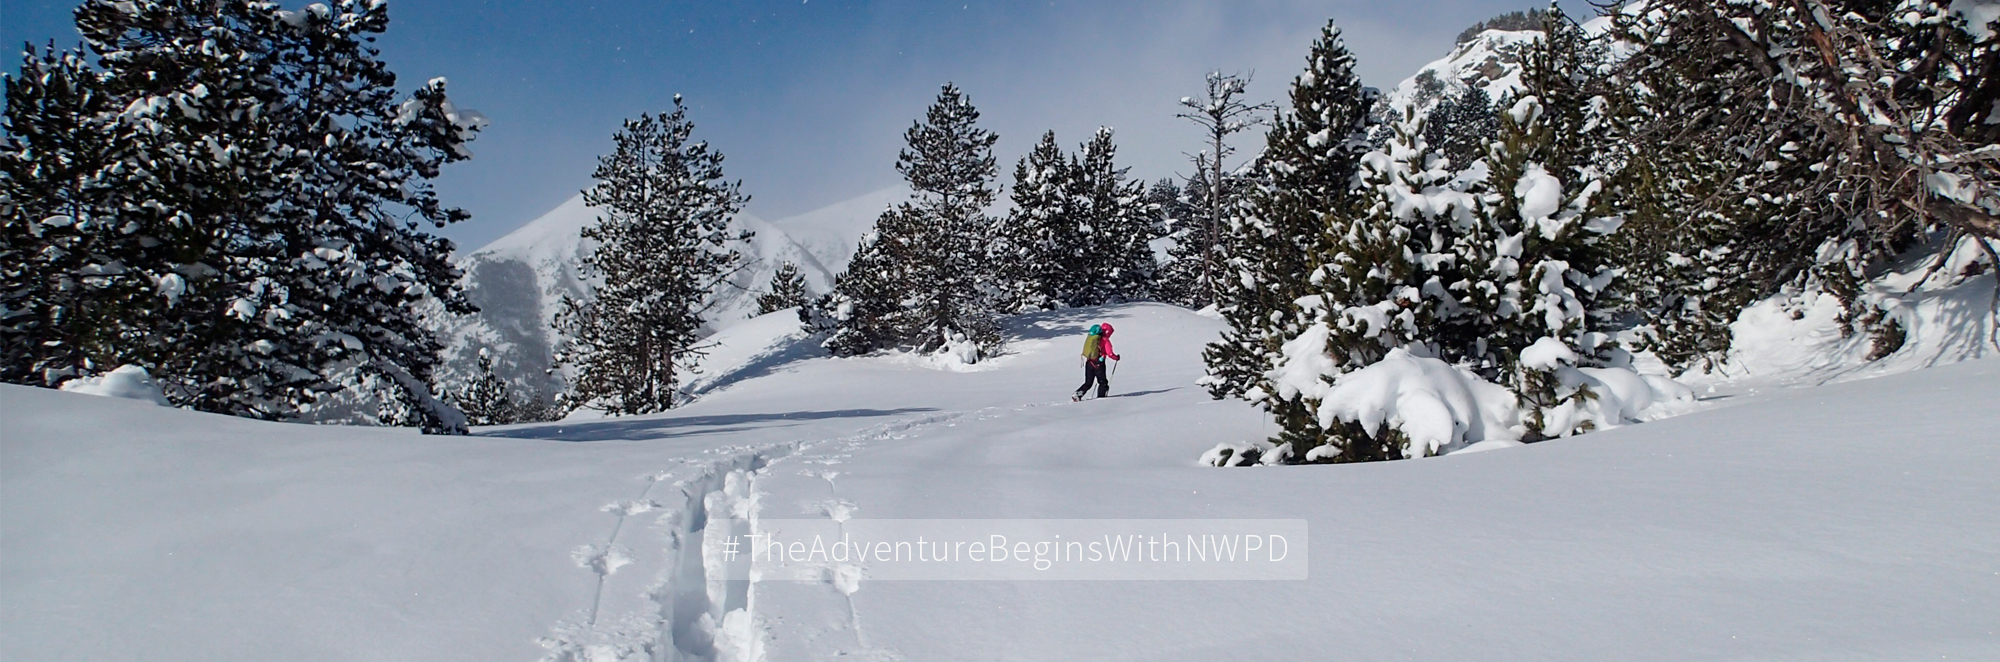 NWPD-ski-touring-2019